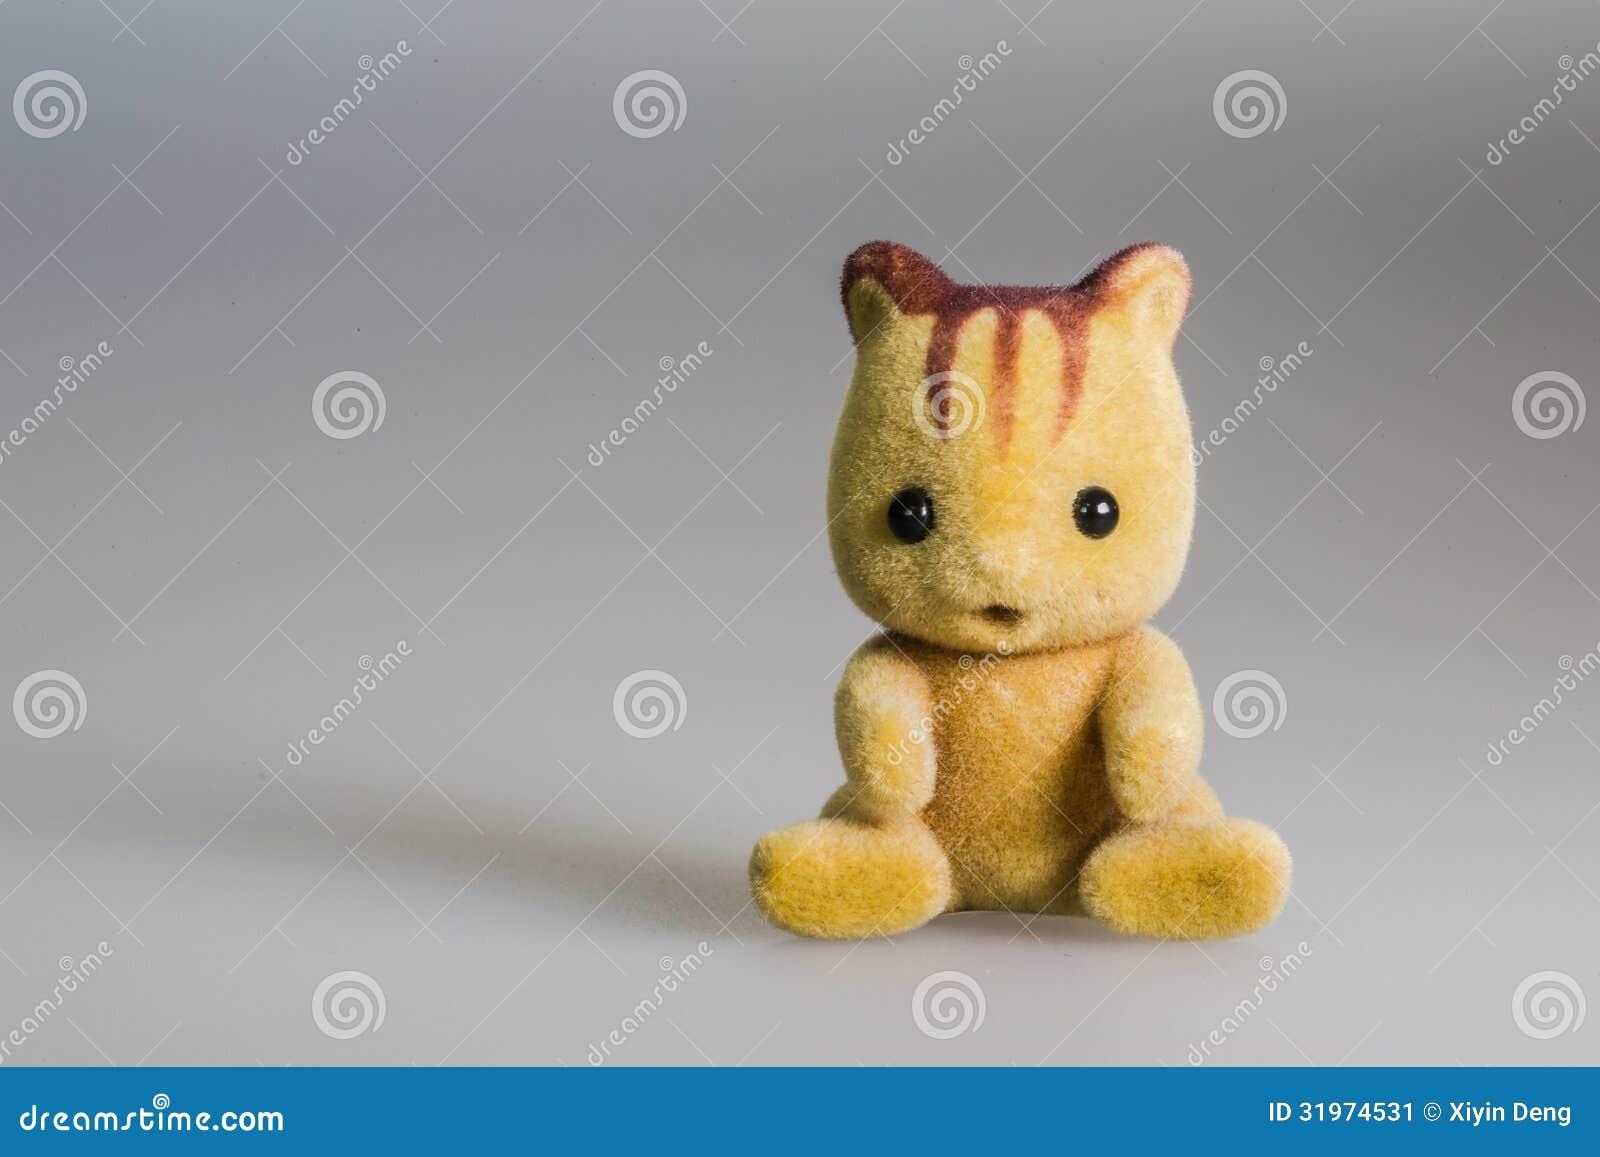 Toy baby squirrel